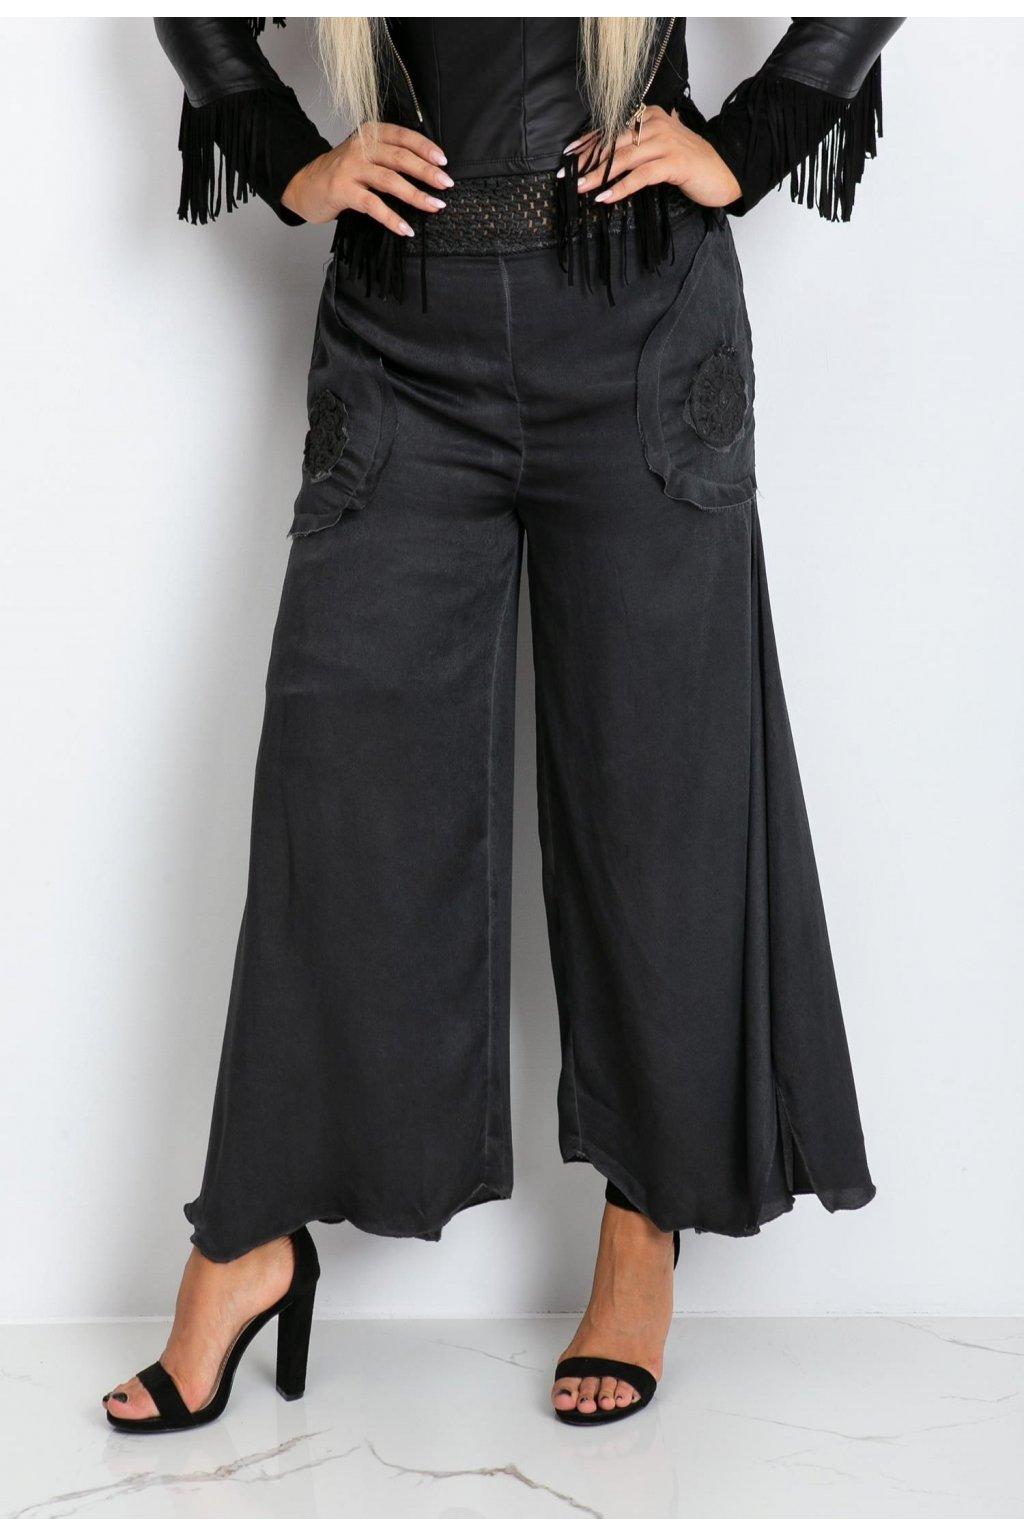 Grafit női nadrág